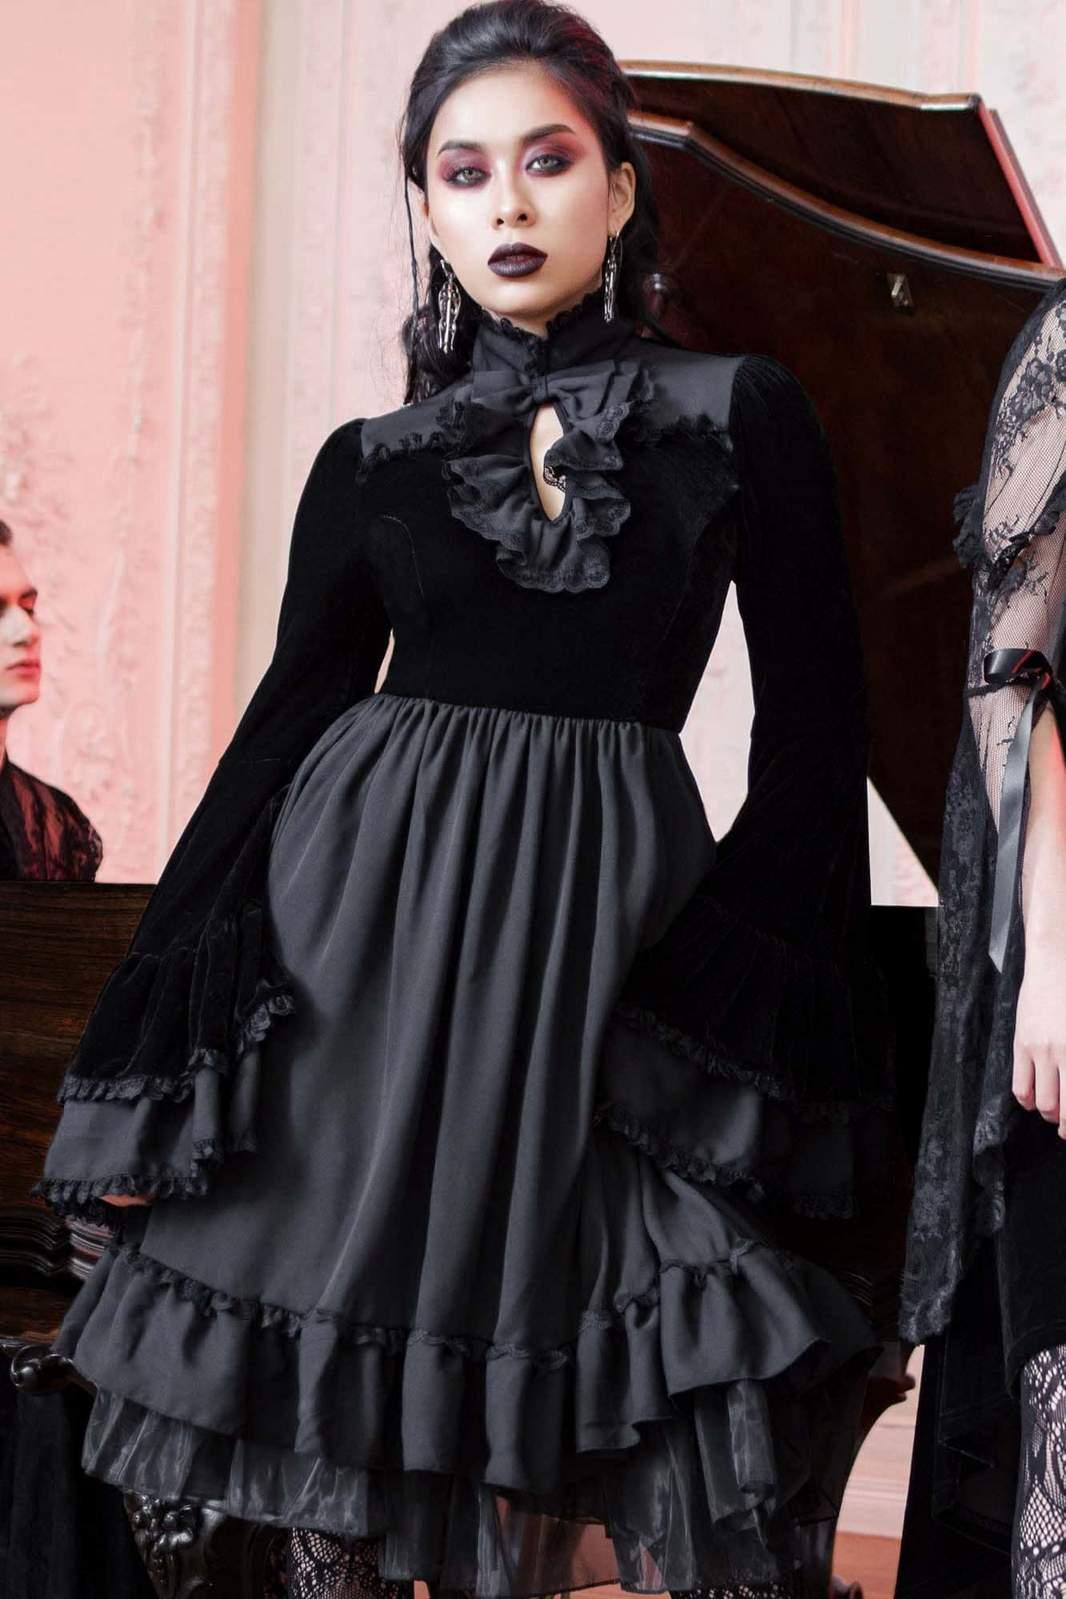 Lost Girl Ruffle Dress Black